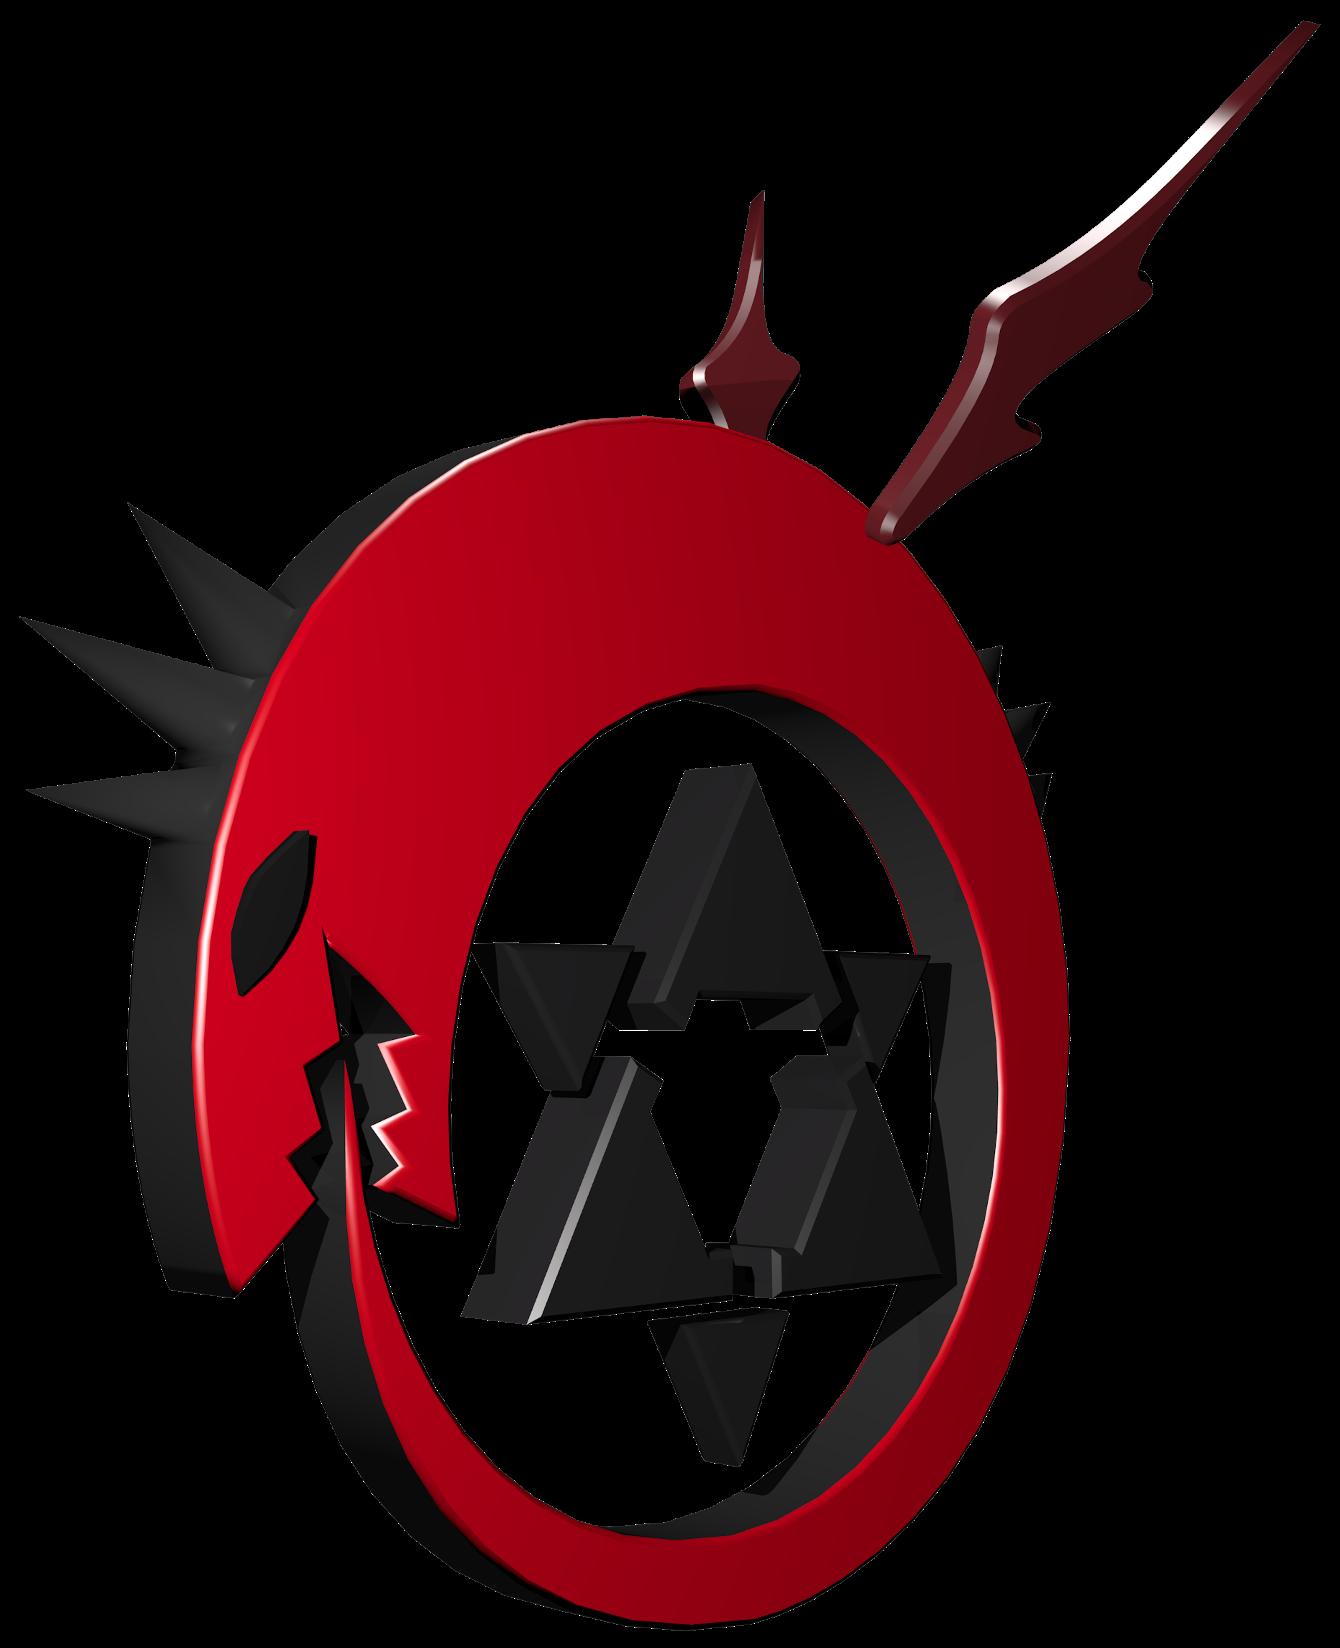 Fullmetal Alchemist State Alchemist Symbol Fullmetal Alchemist